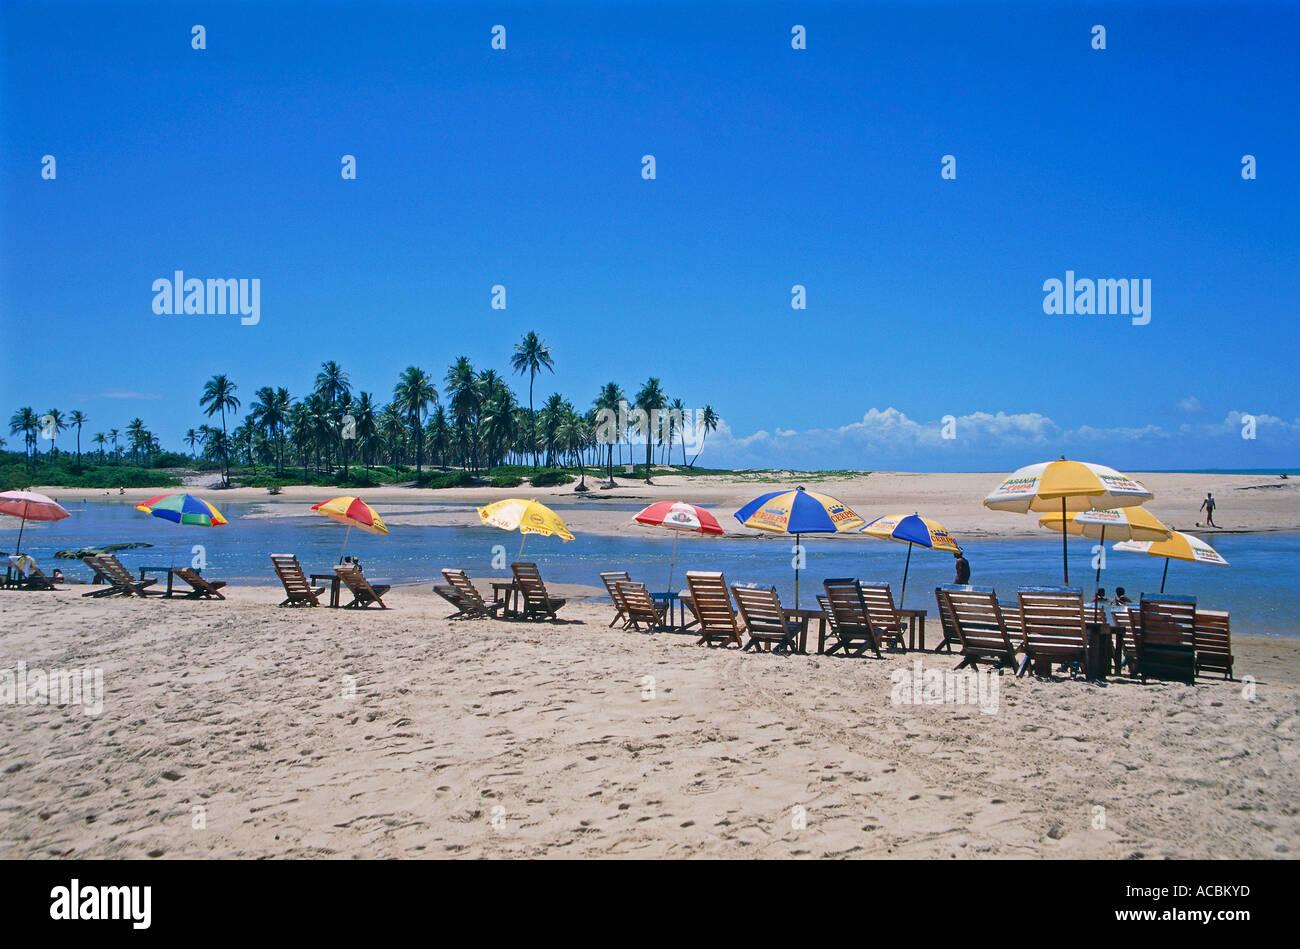 loungers at beach near city of salvador da bahia state of bahia brazil - Stock Image